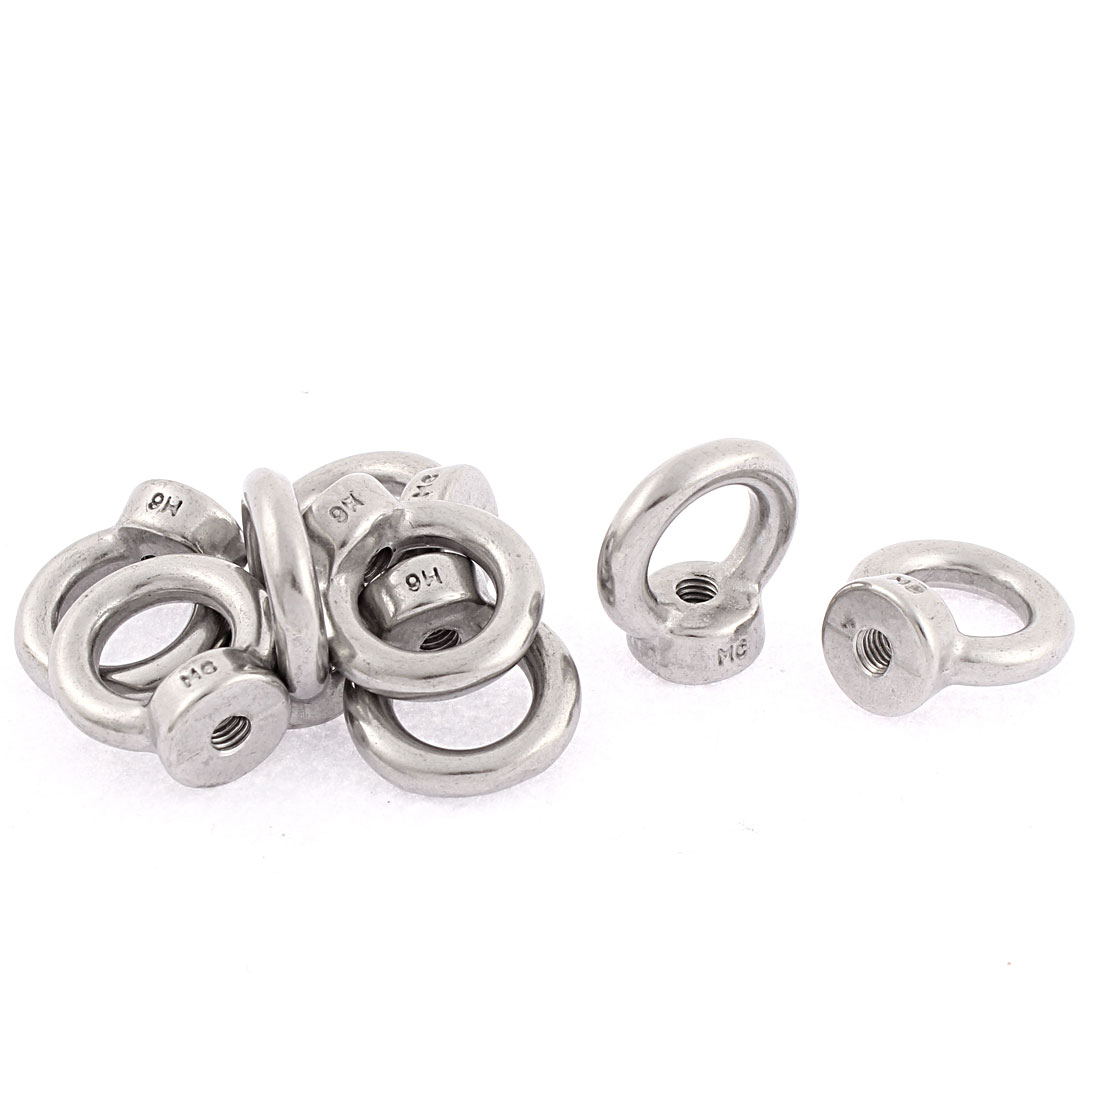 Marine Cable Rope M6 Female Thread Metal Lifting Eye Nuts Bolt Ring 8pcs